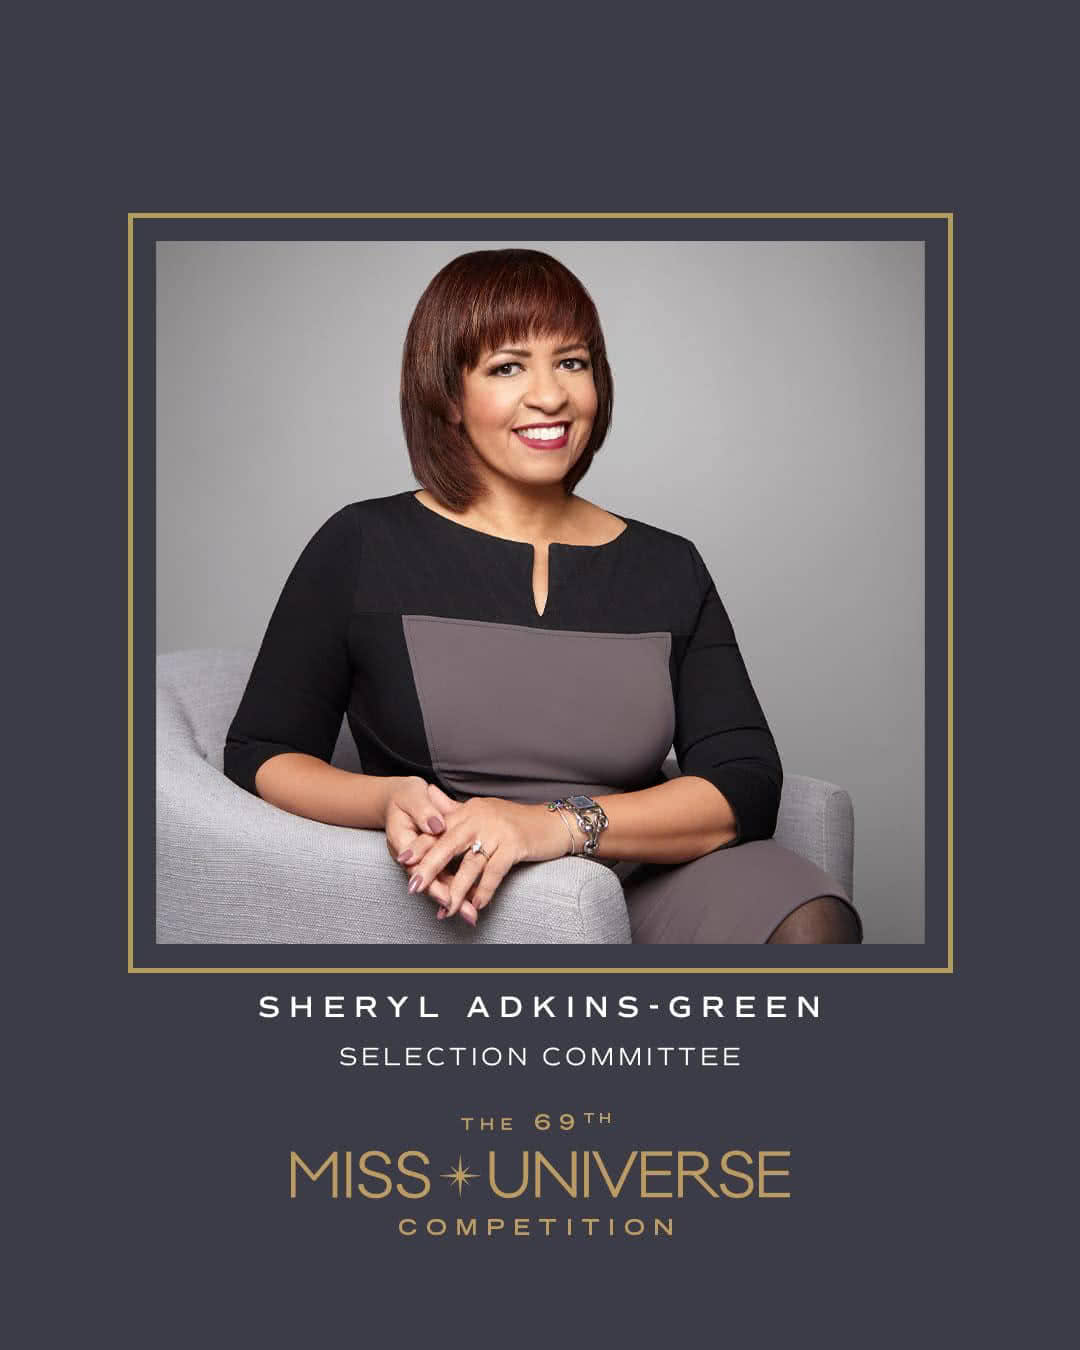 Sheryl Adkins